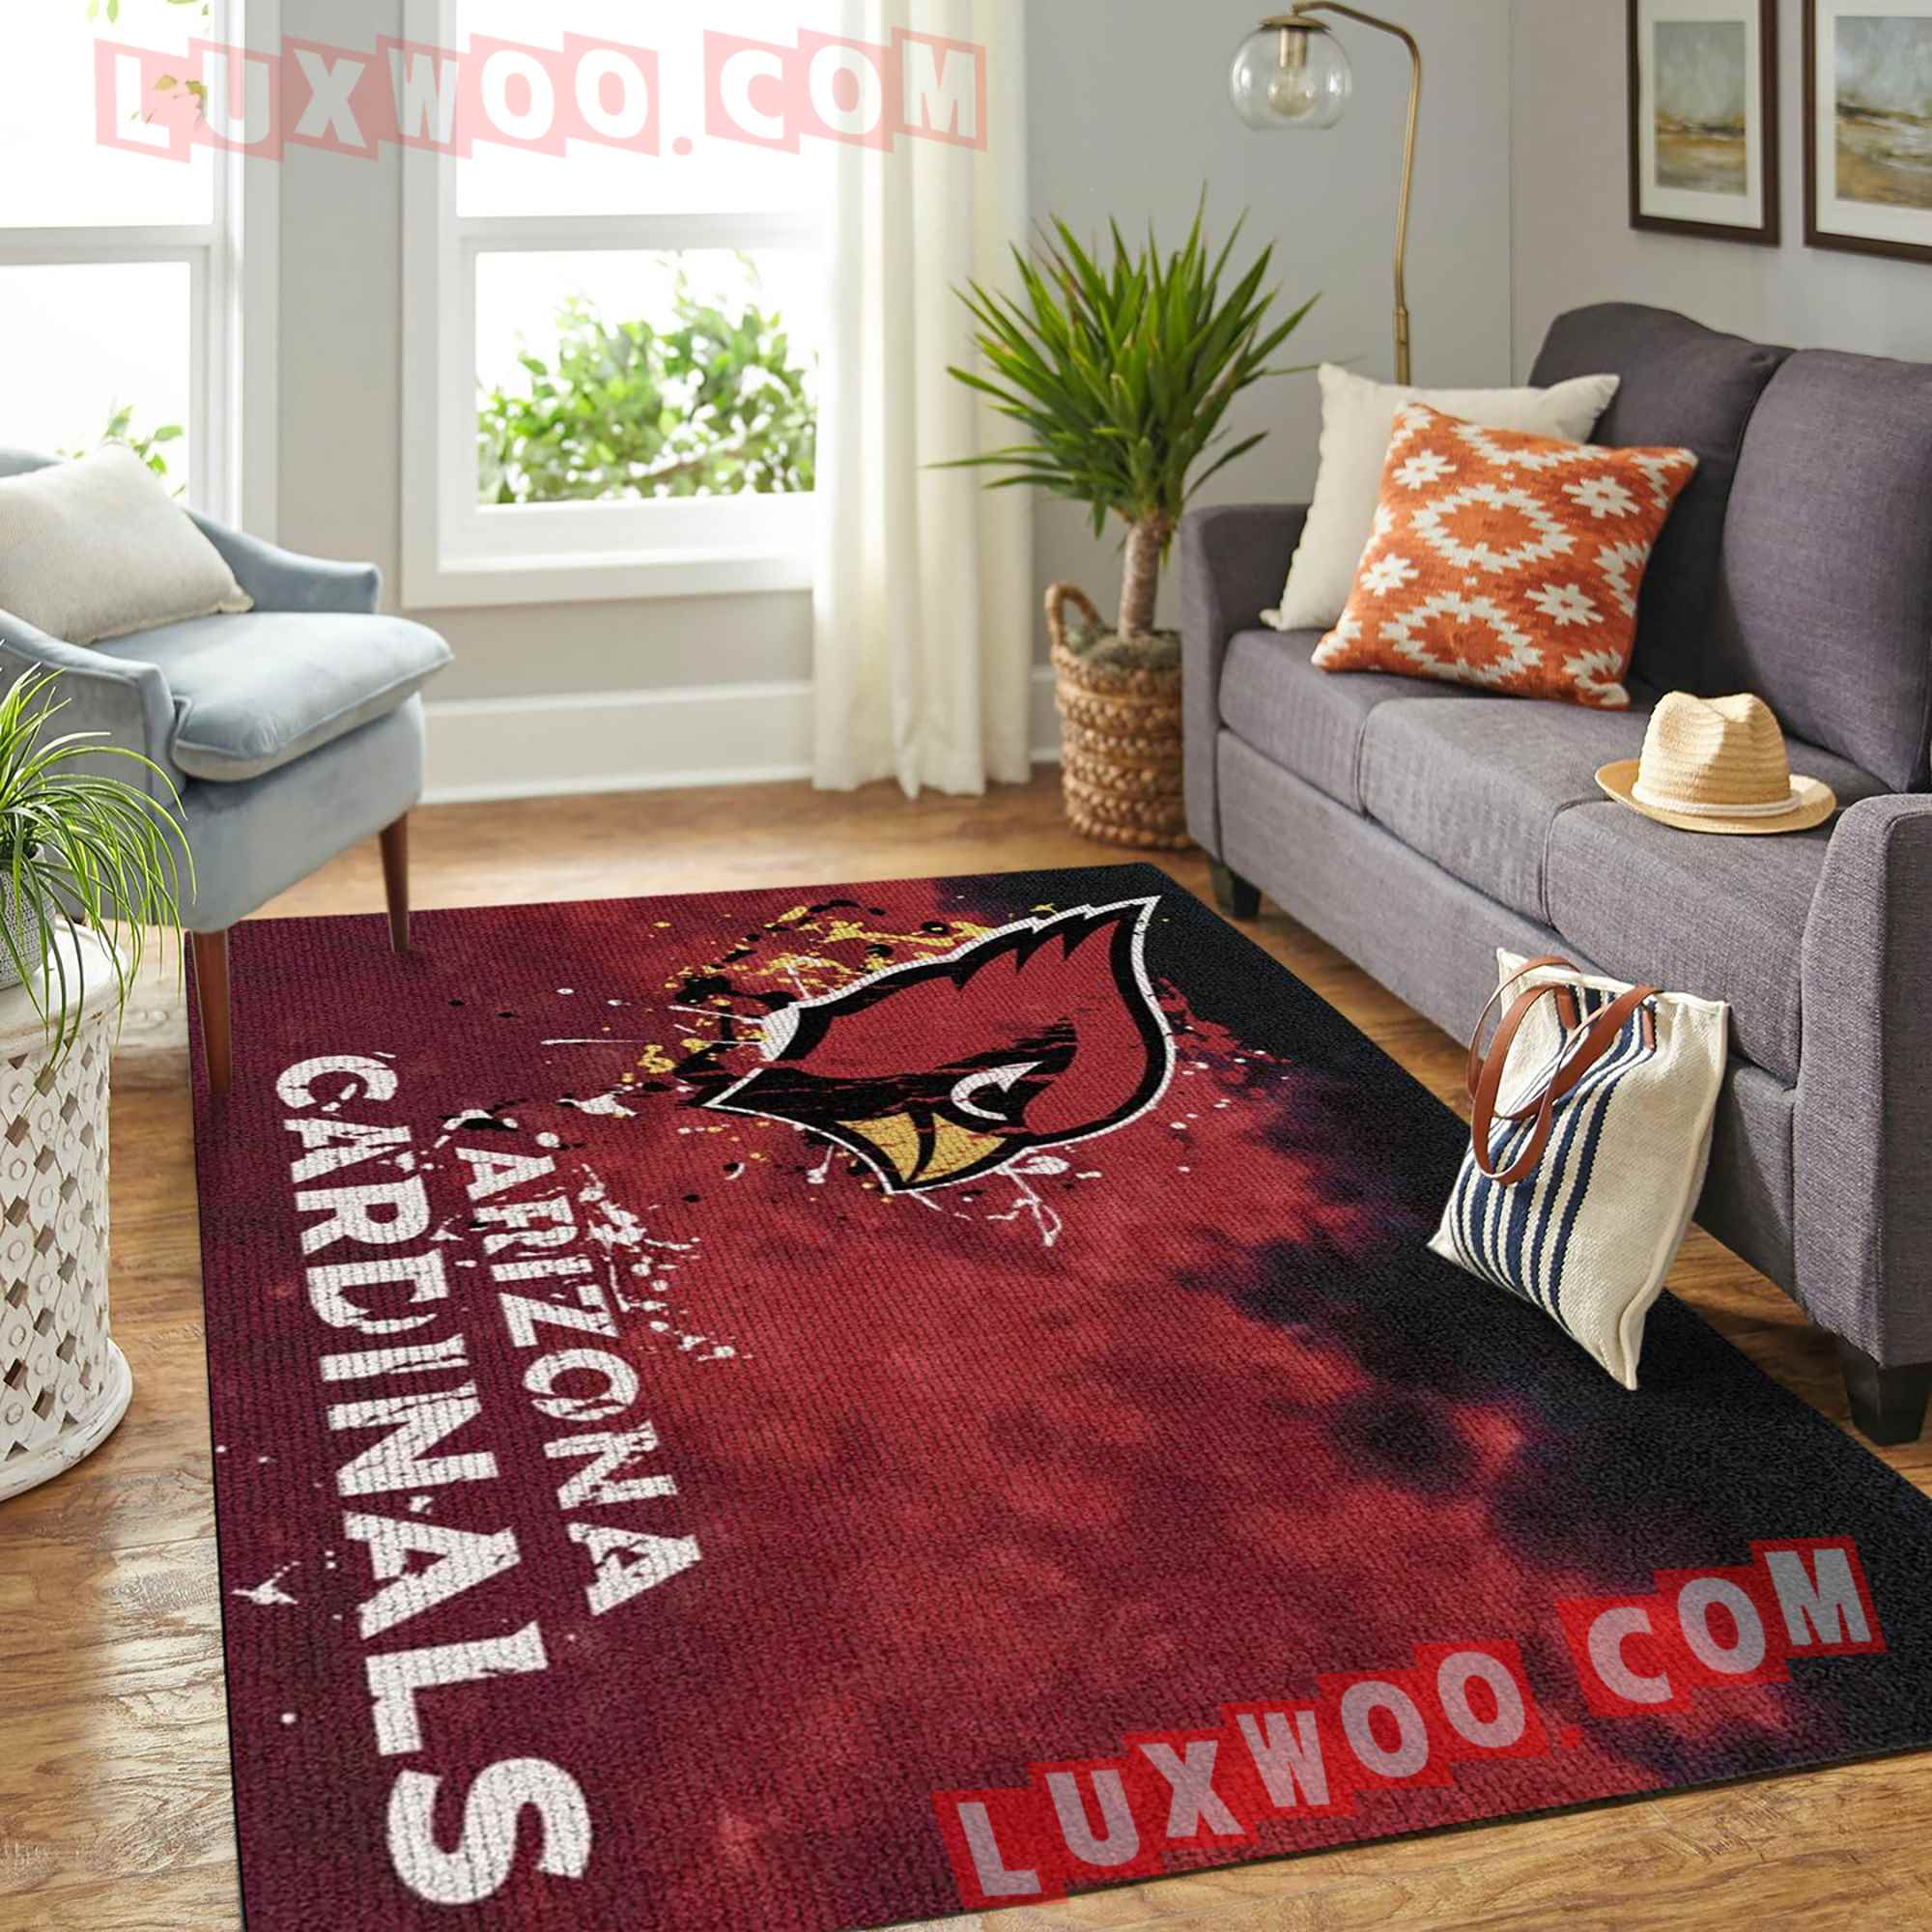 Arizona Cardinals American Flag Us Football Nfl 3d Living Room Rugs V3